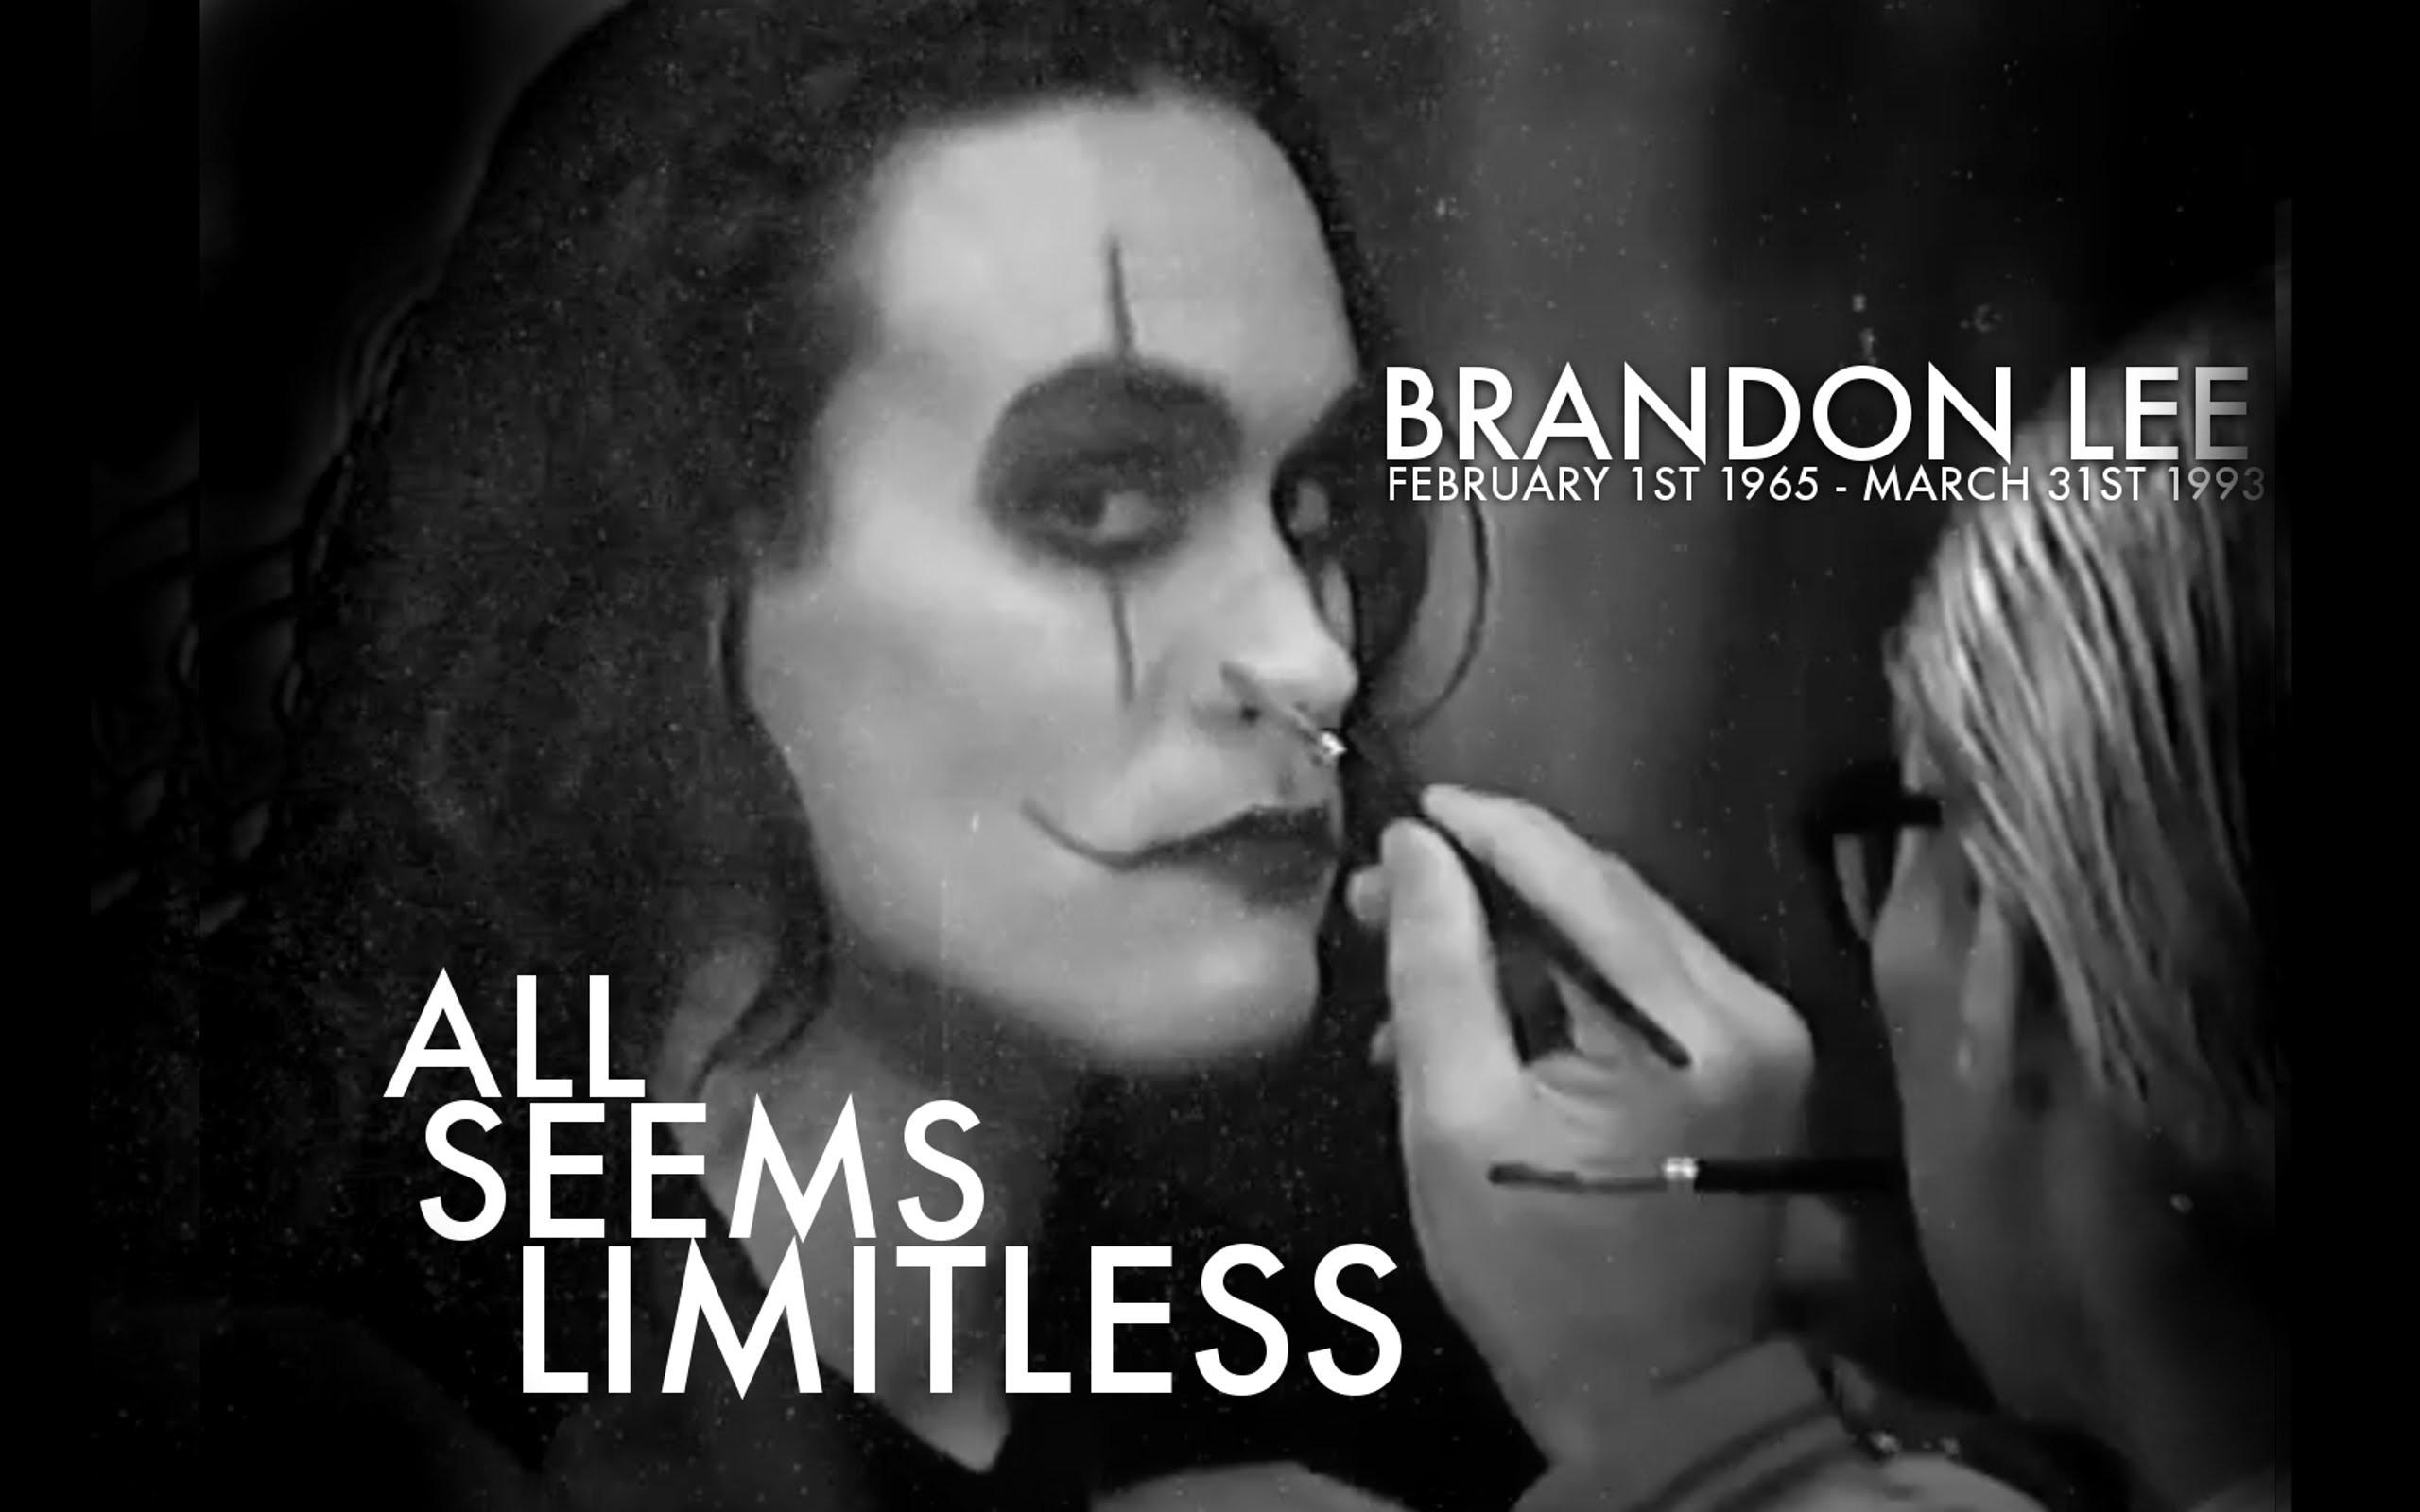 Brandon Lee – All Seems Limitless